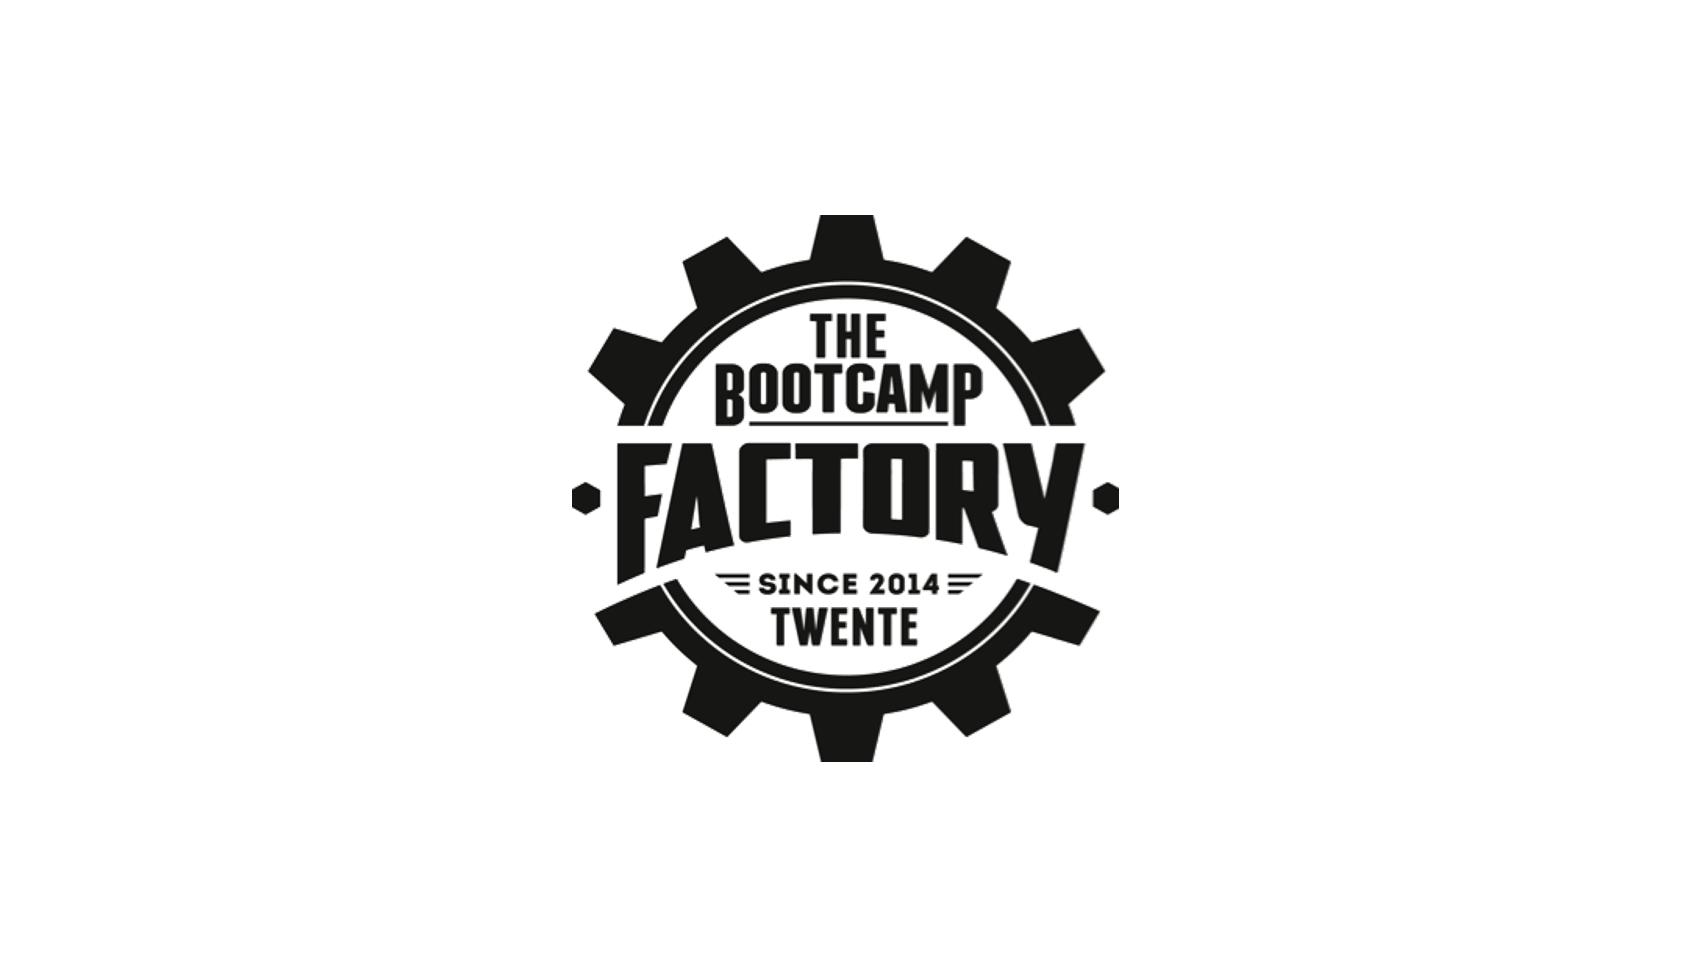 The Bootcamp Factory Twente